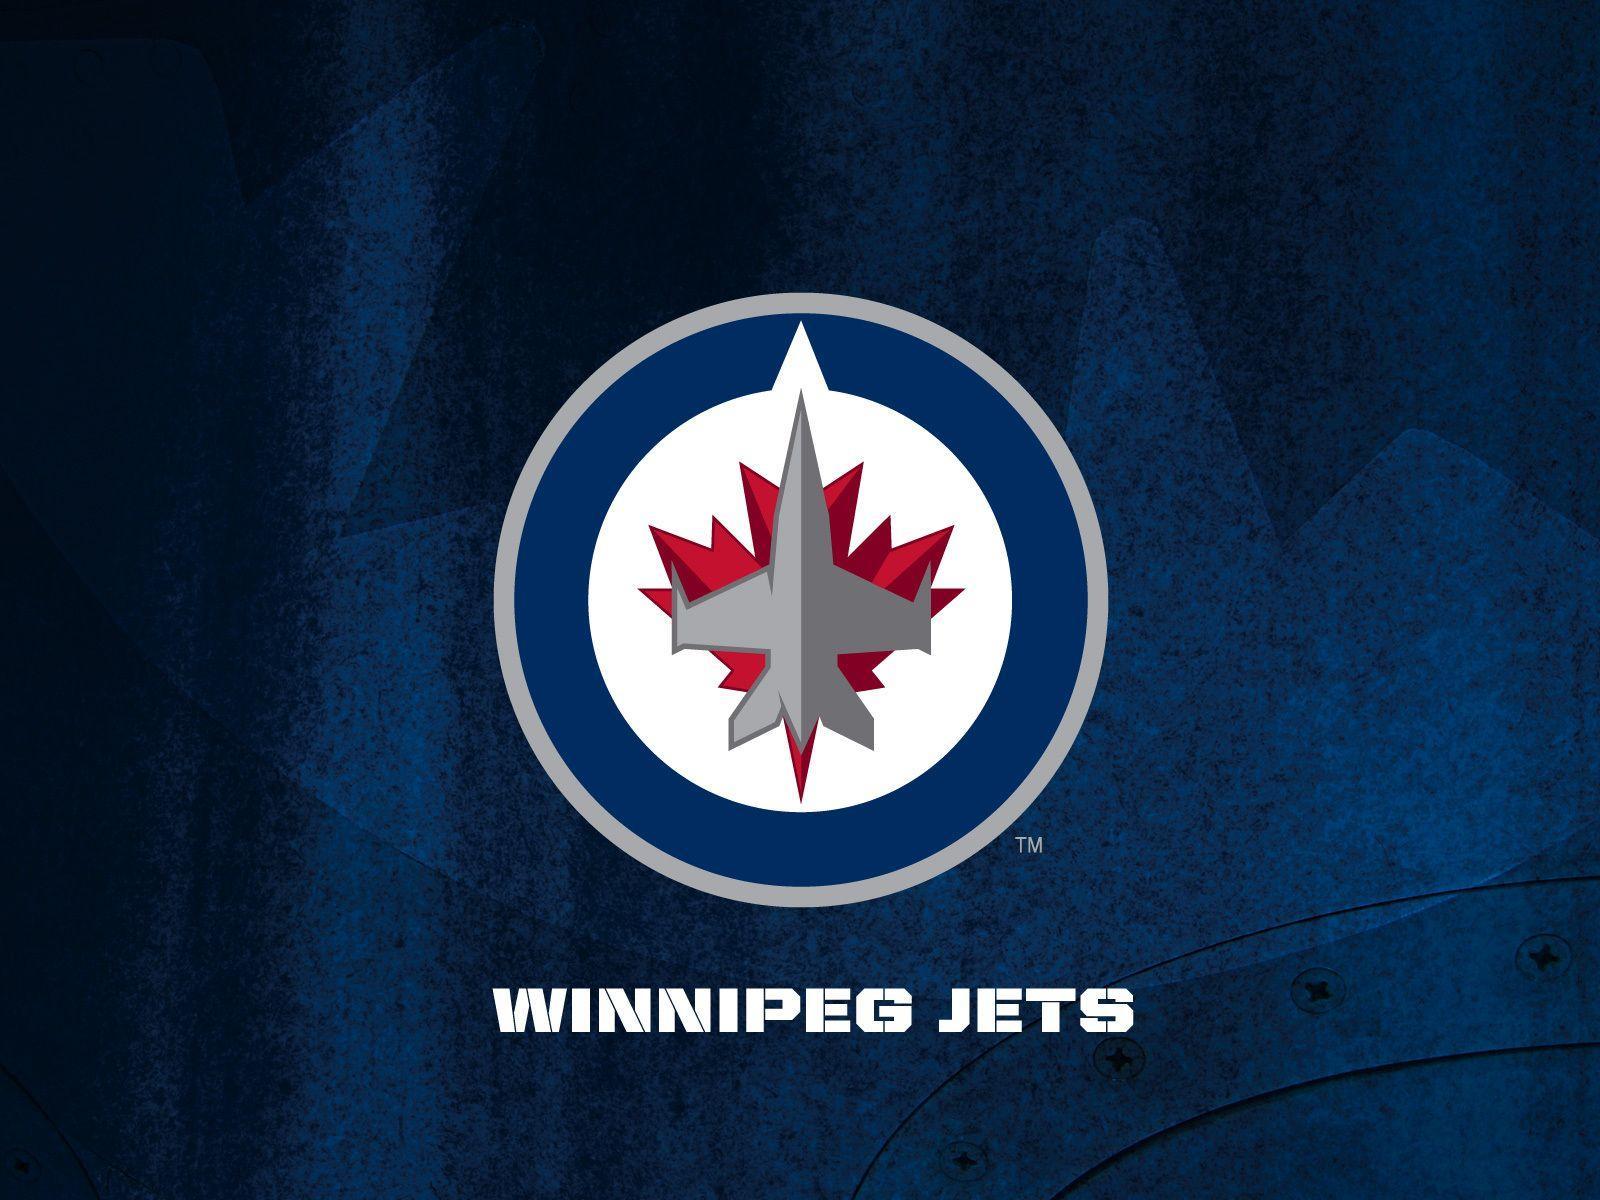 Winnipeg jets iphone wallpaper